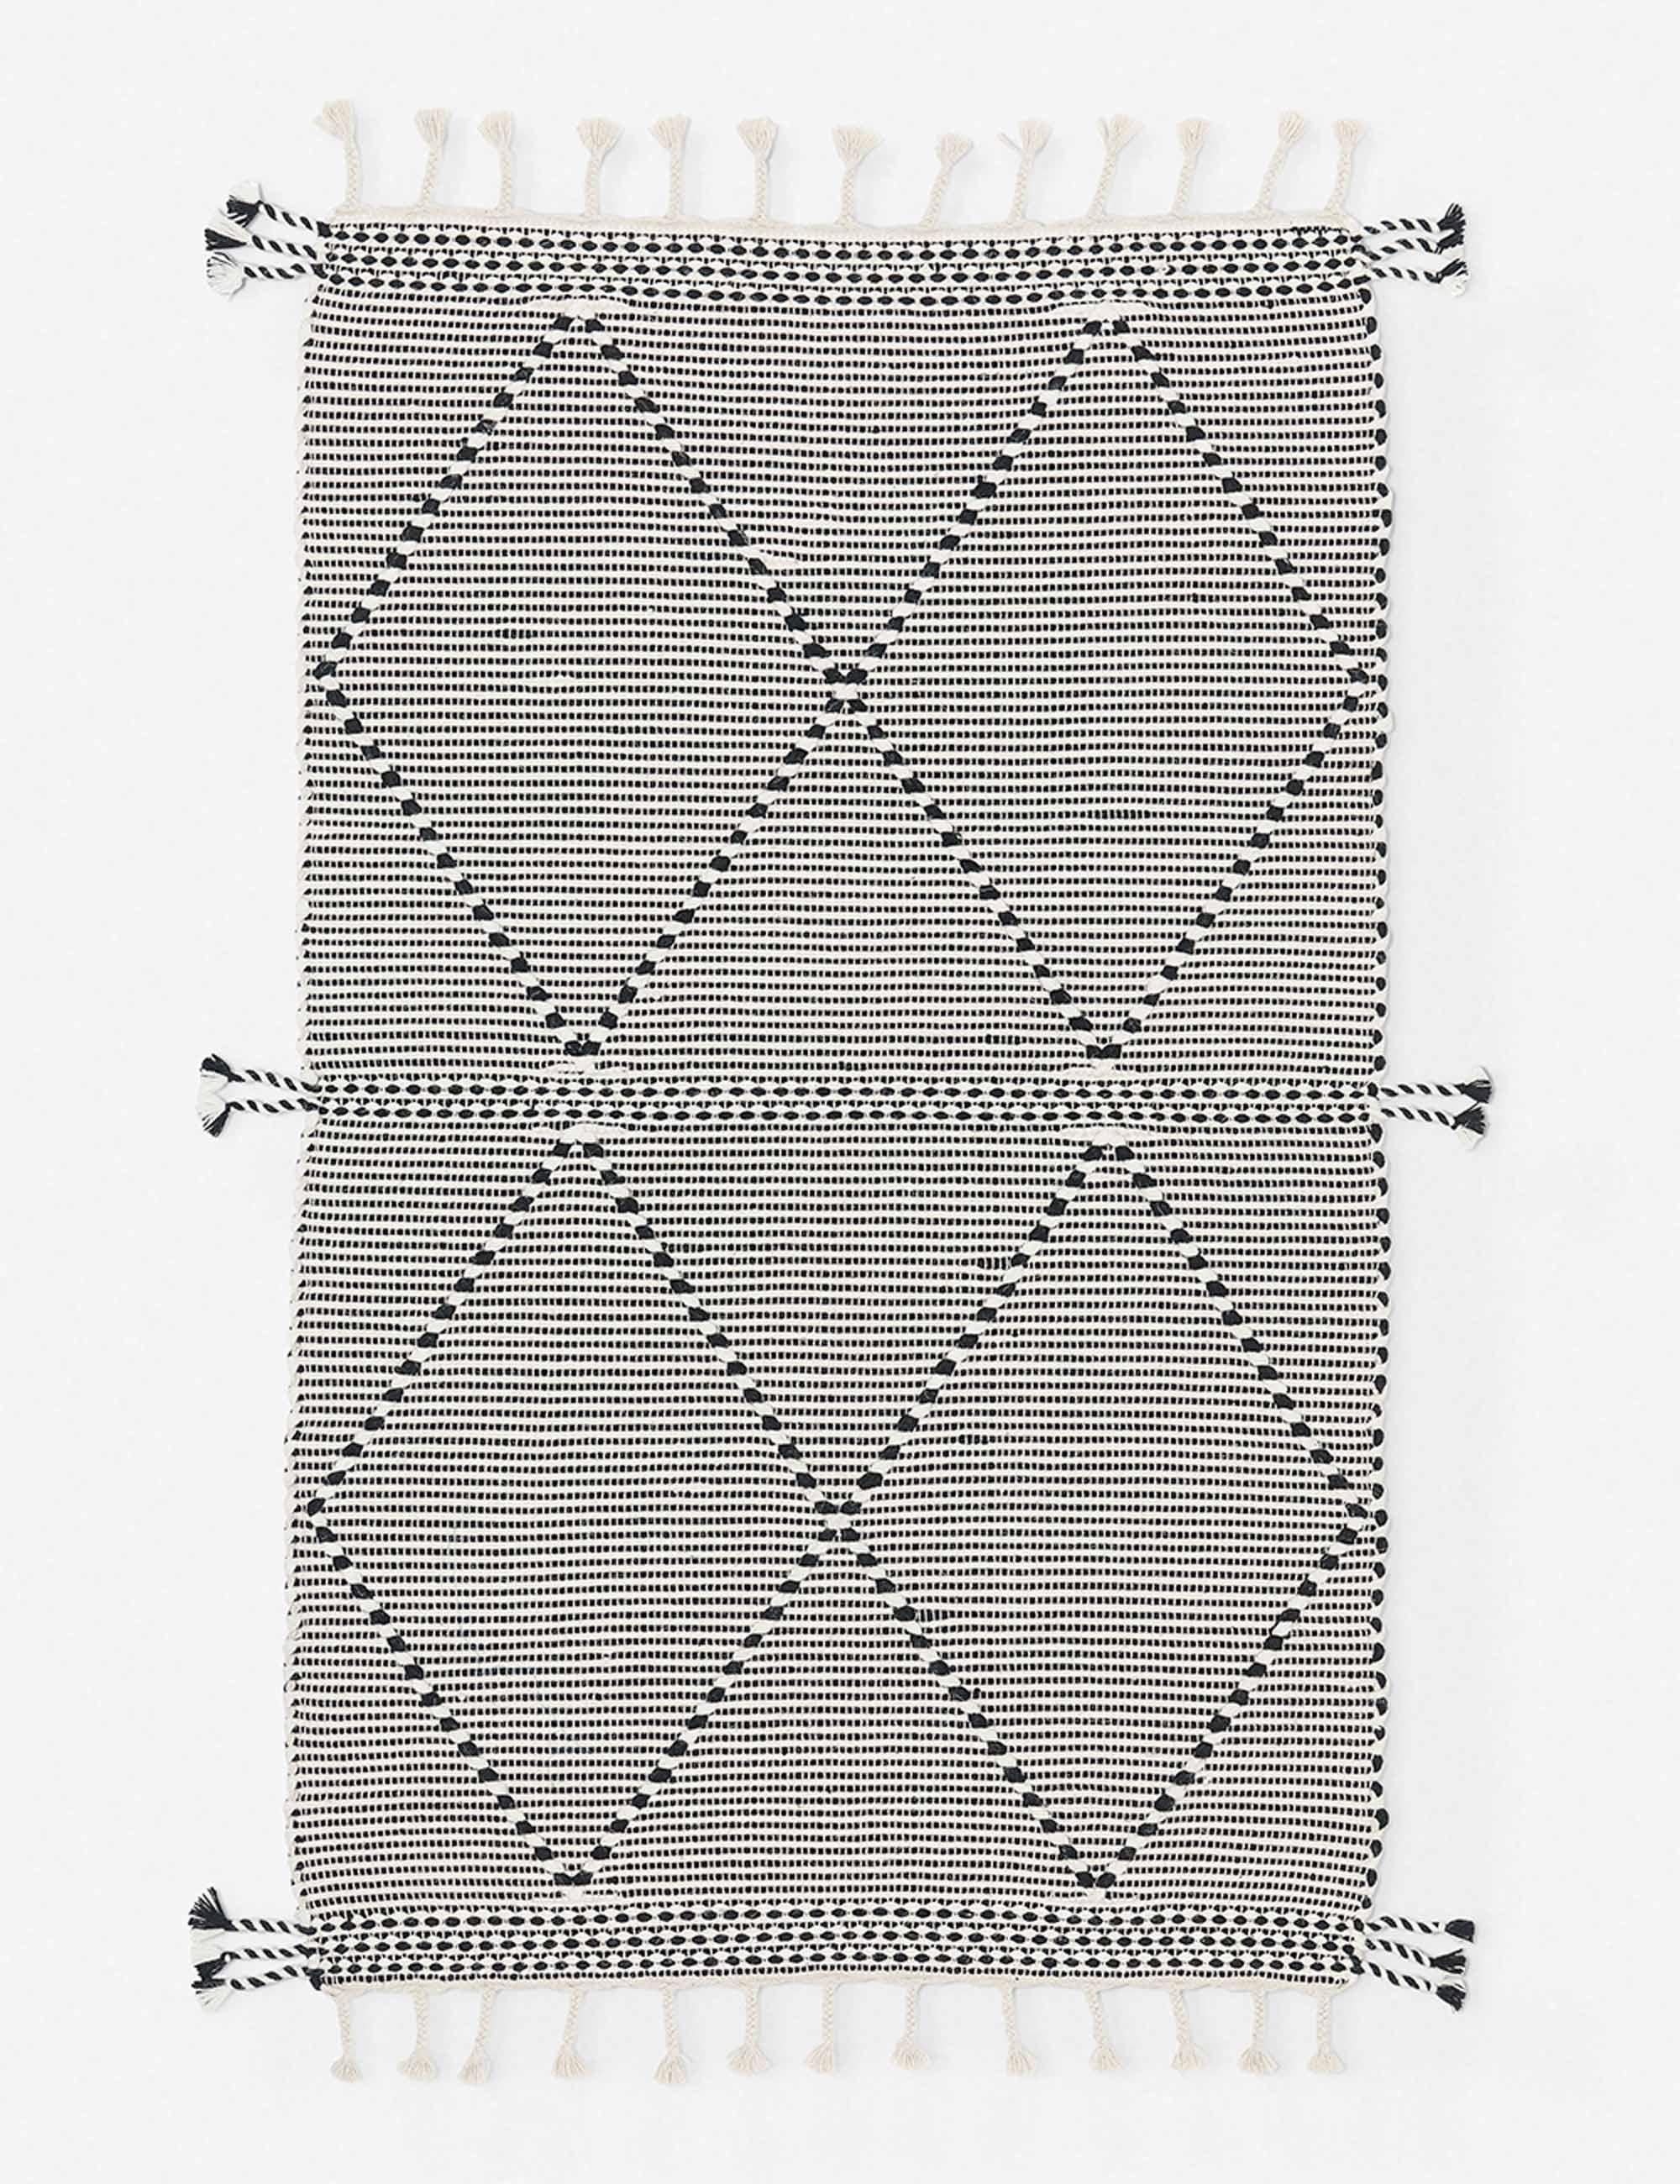 Taza Rug, Black and White 3x5